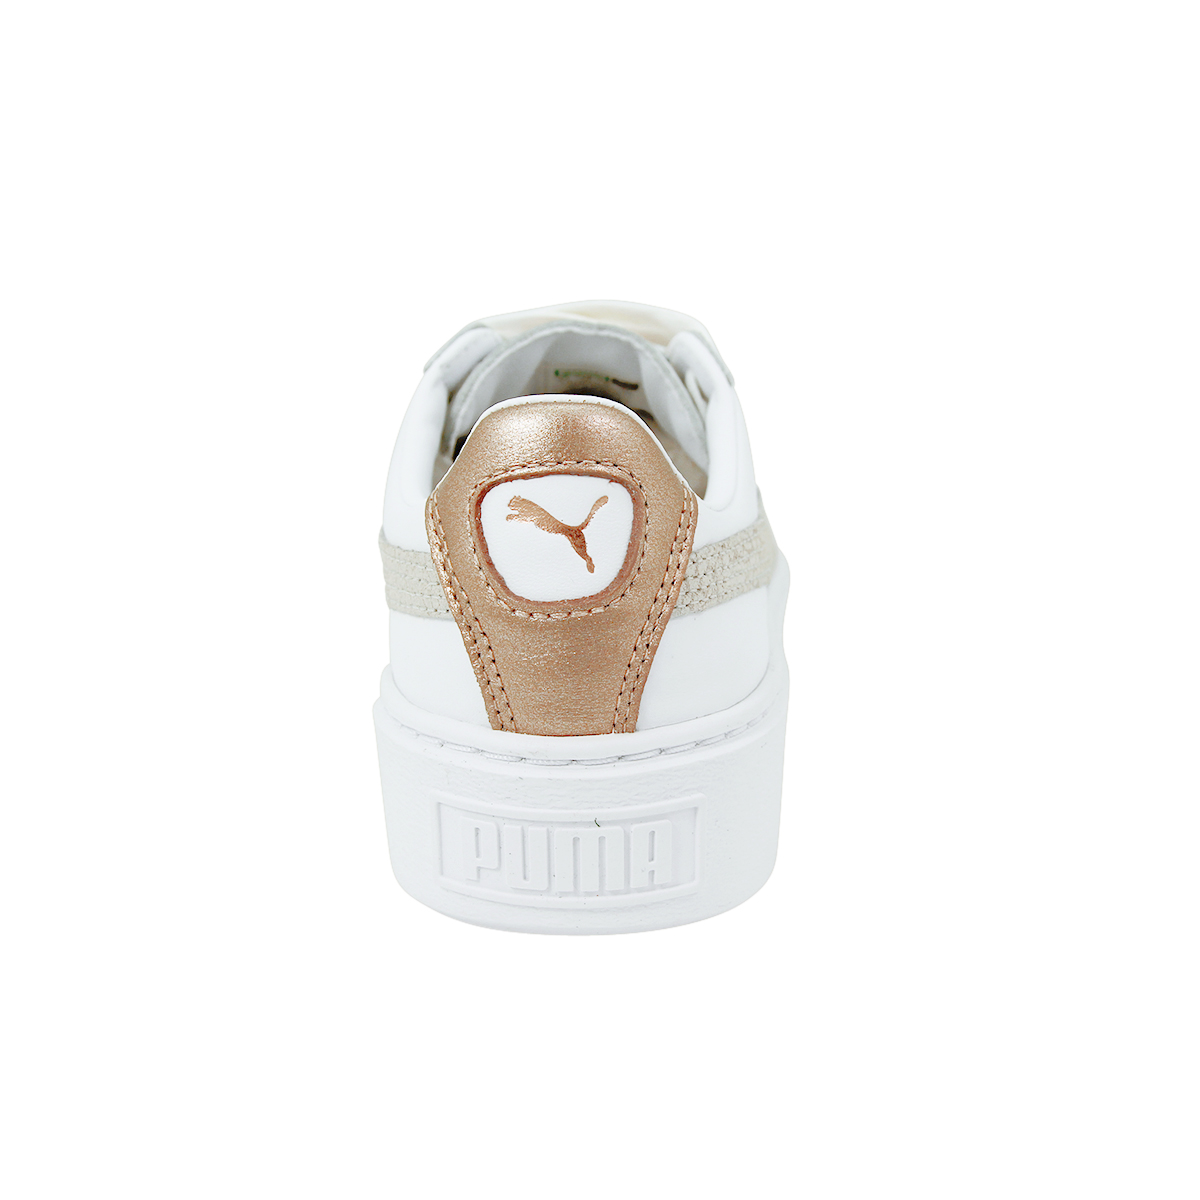 Puma BASKET PLATFORM RG EURPHORIA RG PLATFORM Leder Damen Sneakers Schuhe Neu 2ab423